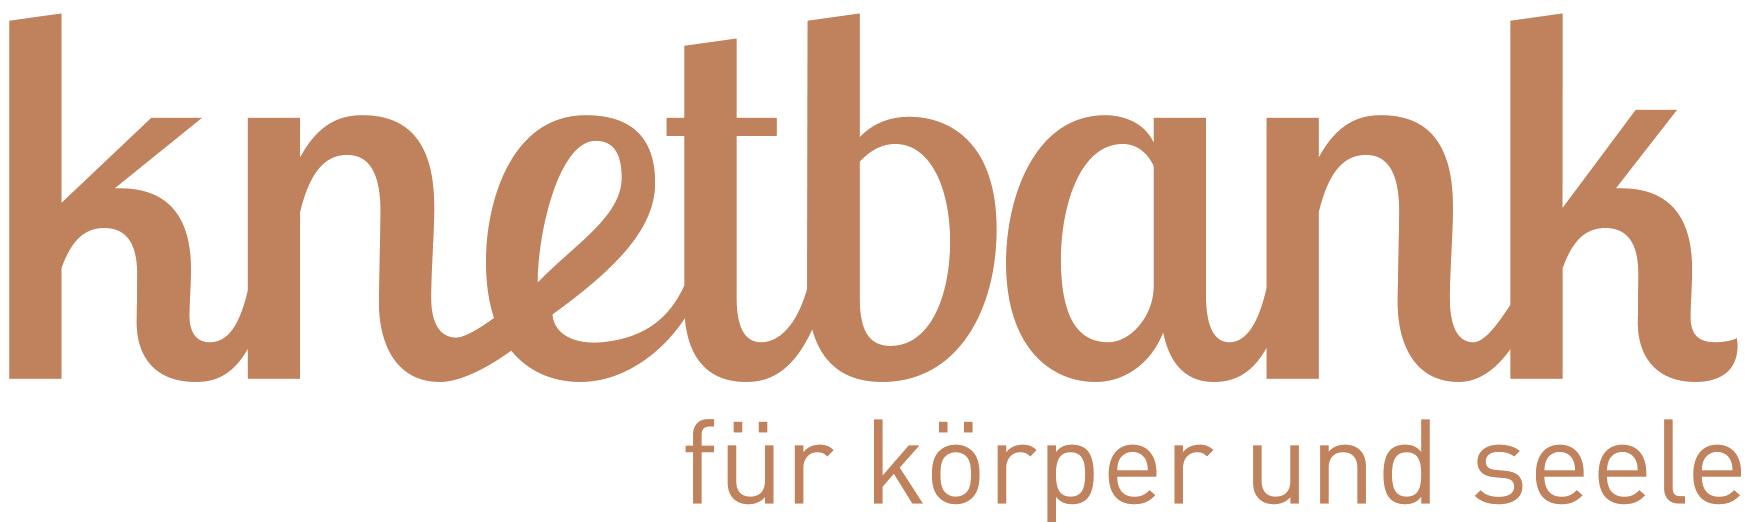 Knetbank Bern – Wellness Oase, Massage und Kosmetik